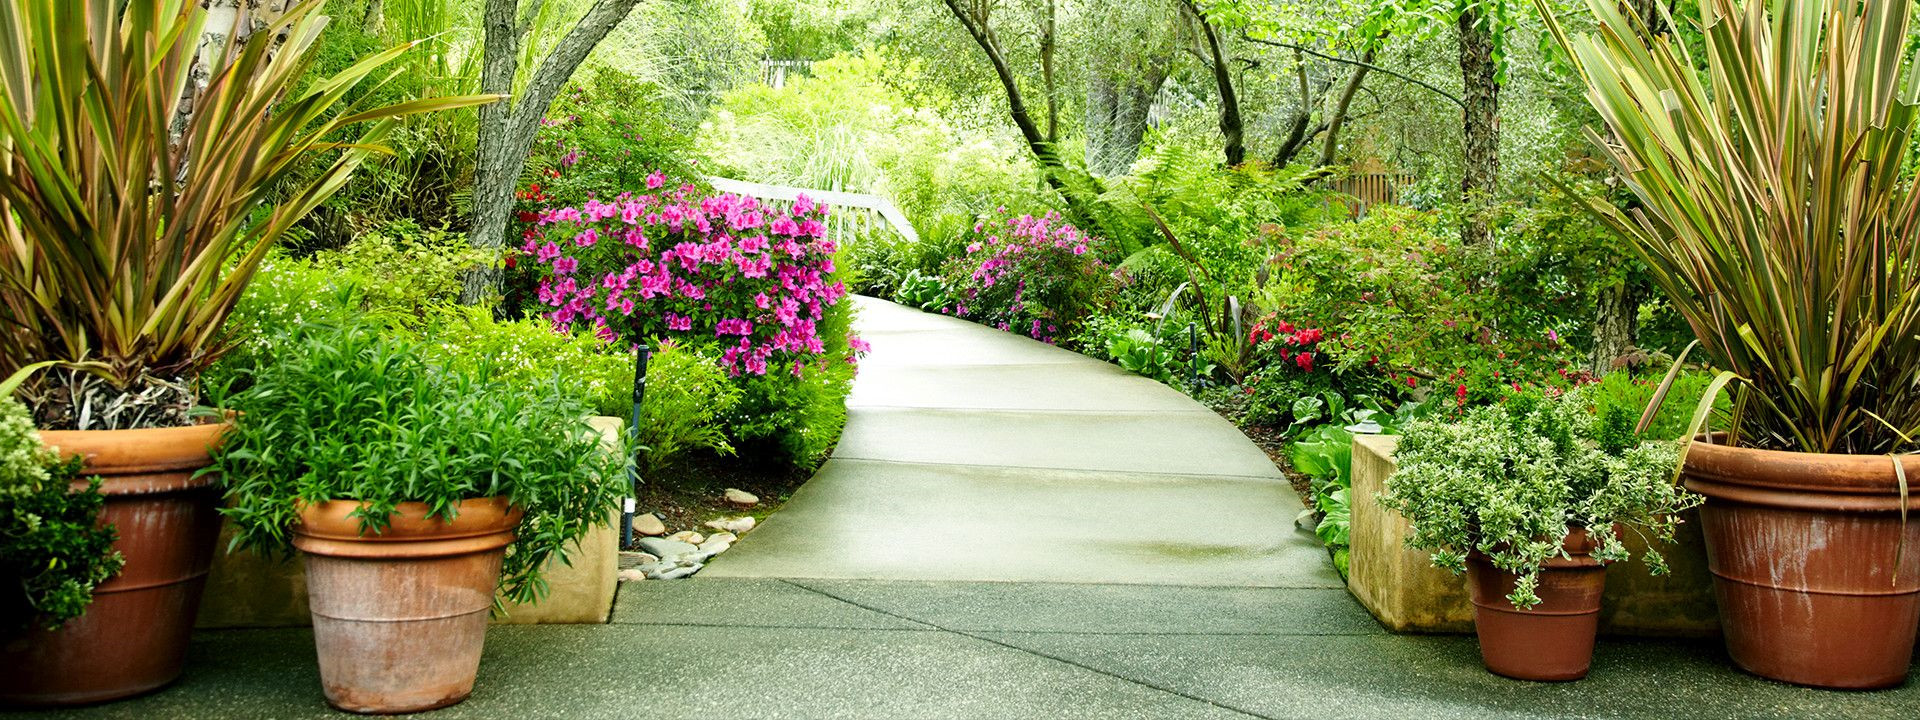 Resources | Evergreen Memorial Park & Mausoleum